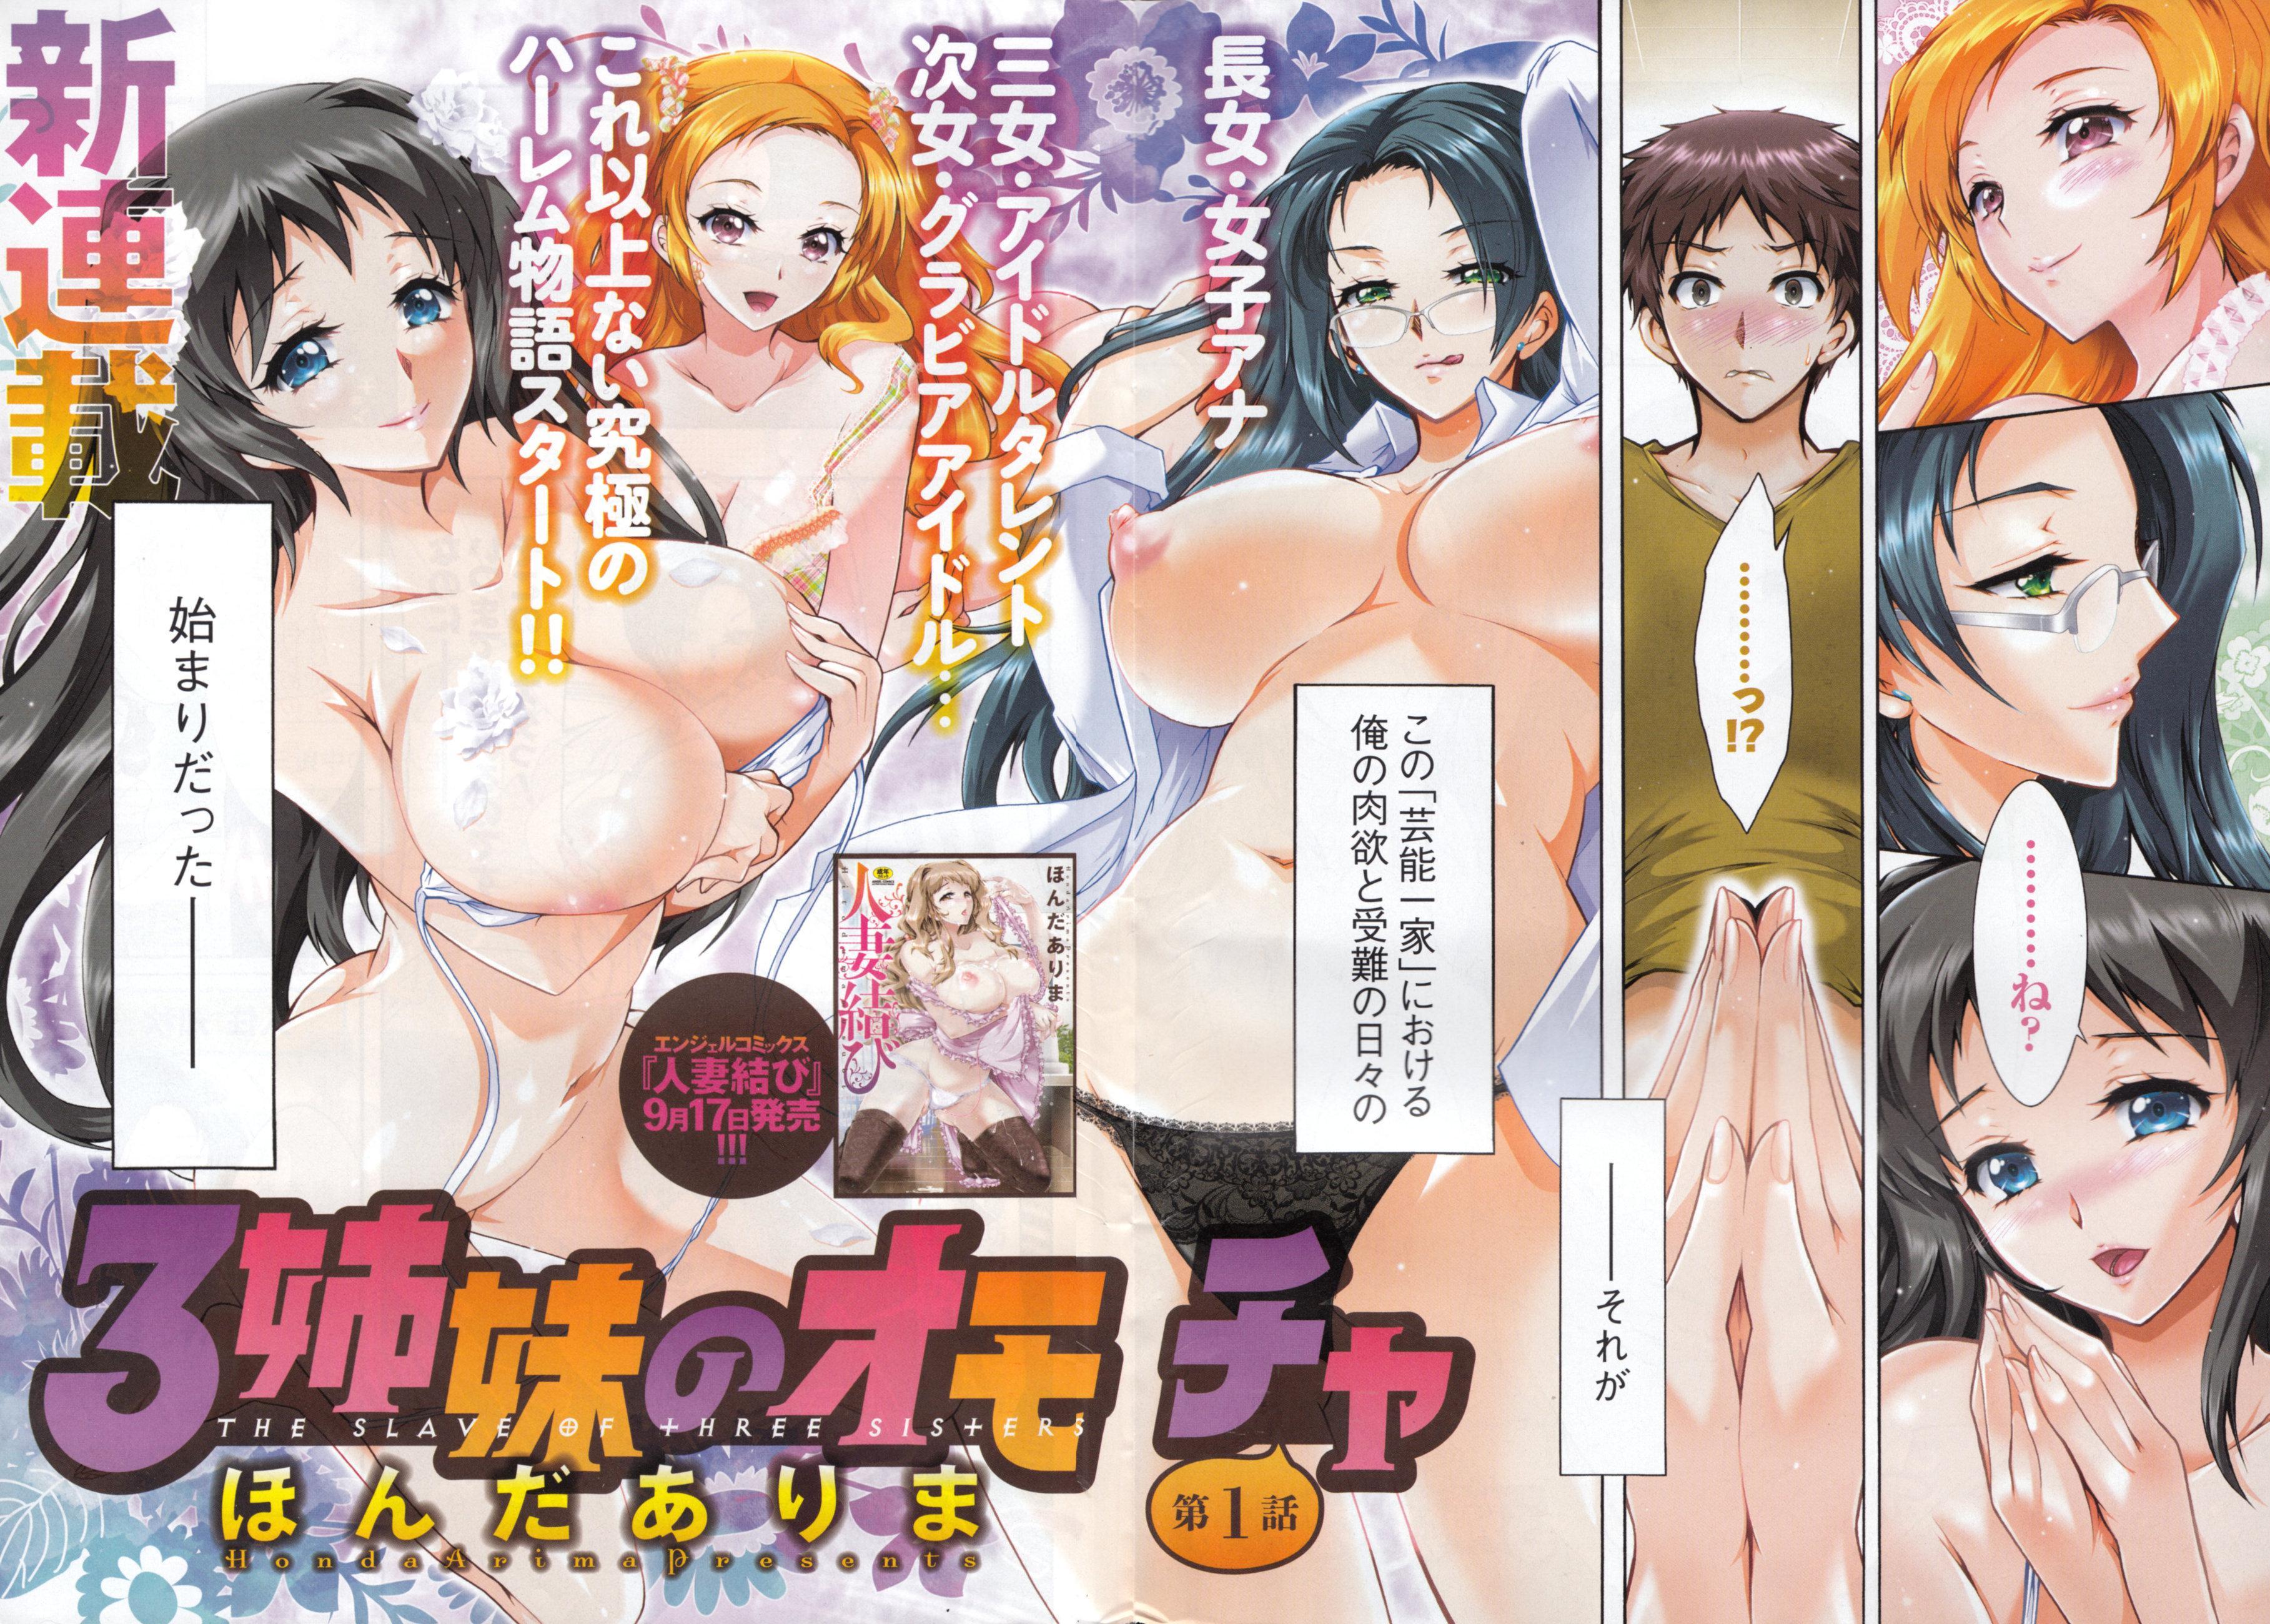 [Honda Arima] Sanshimai no Omocha - The Slave of Three Sisters Ch. 1-6 1